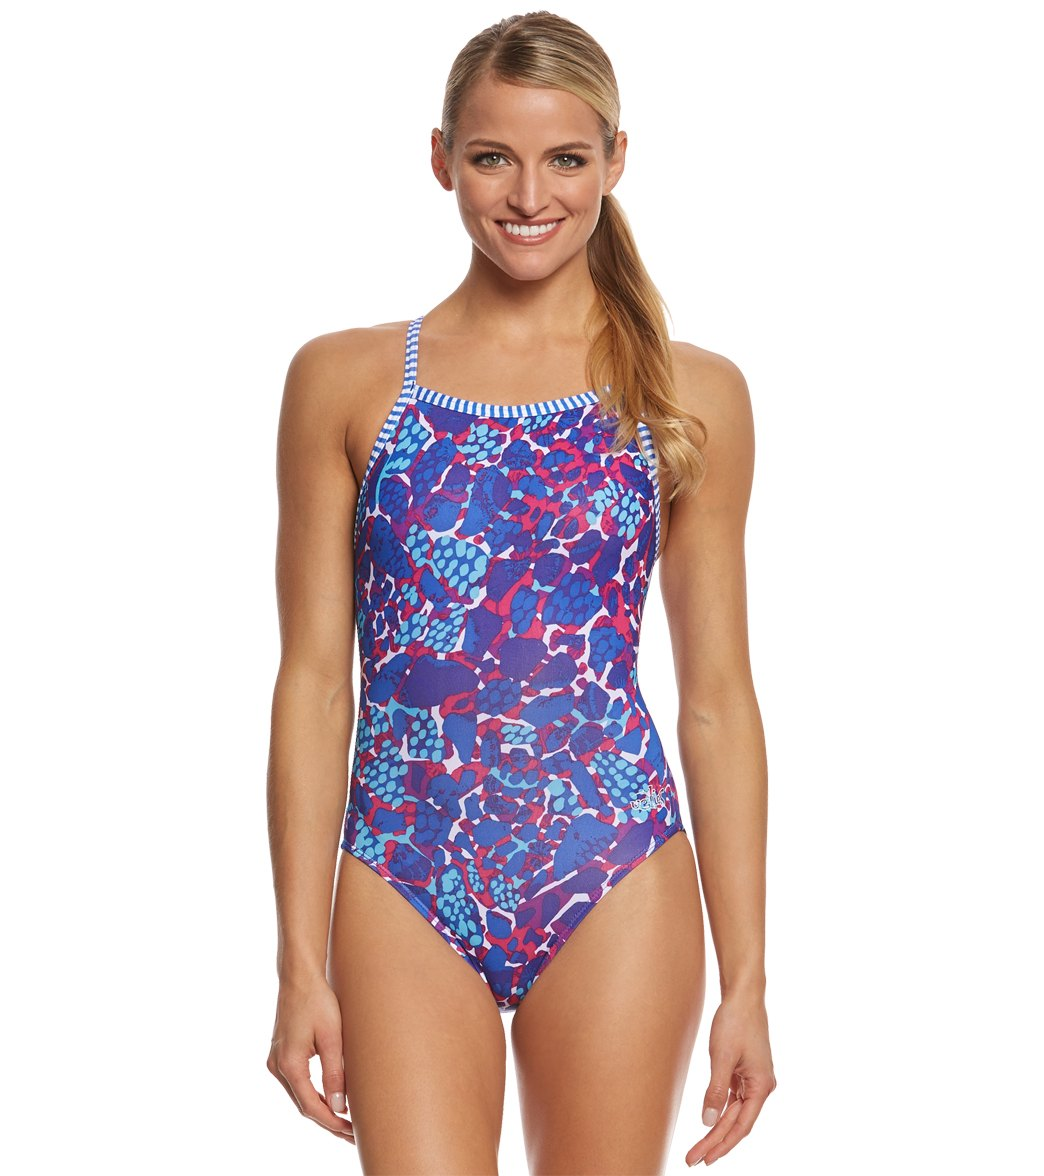 c765929946 Dolfin Uglies Women's Surfari V-2 Back One Piece Swimsuit at ...